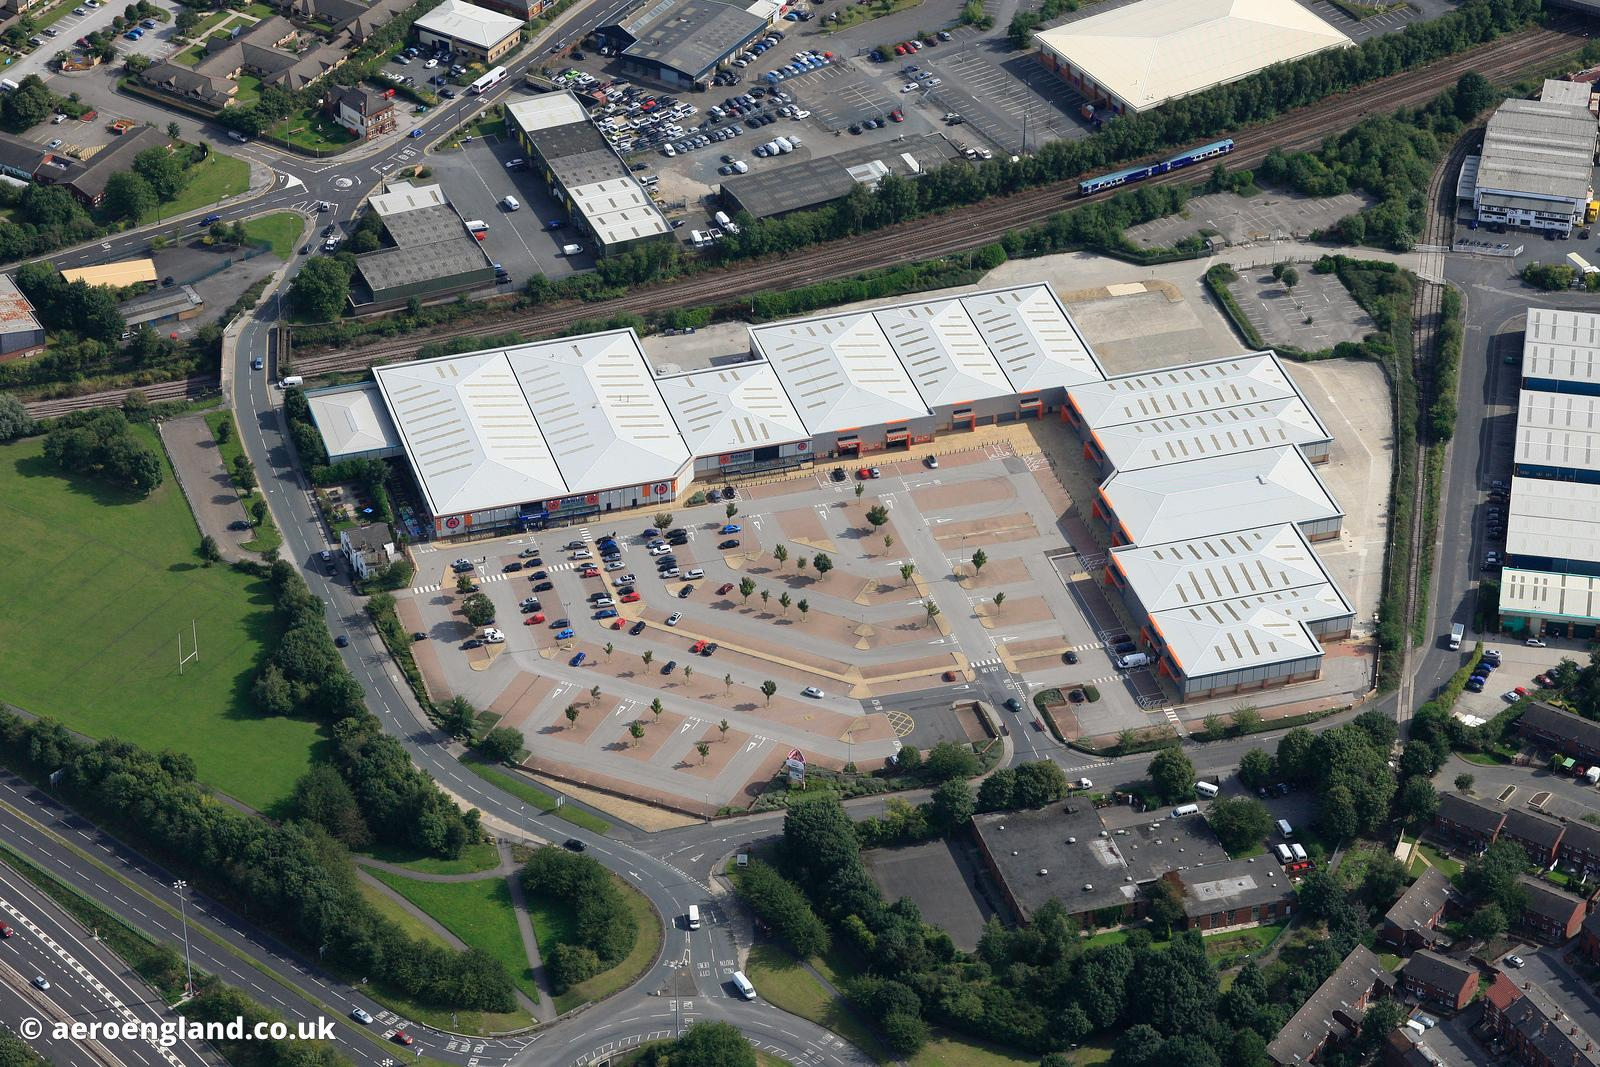 aeroengland   aerial photograph of Tulip South Retail Park